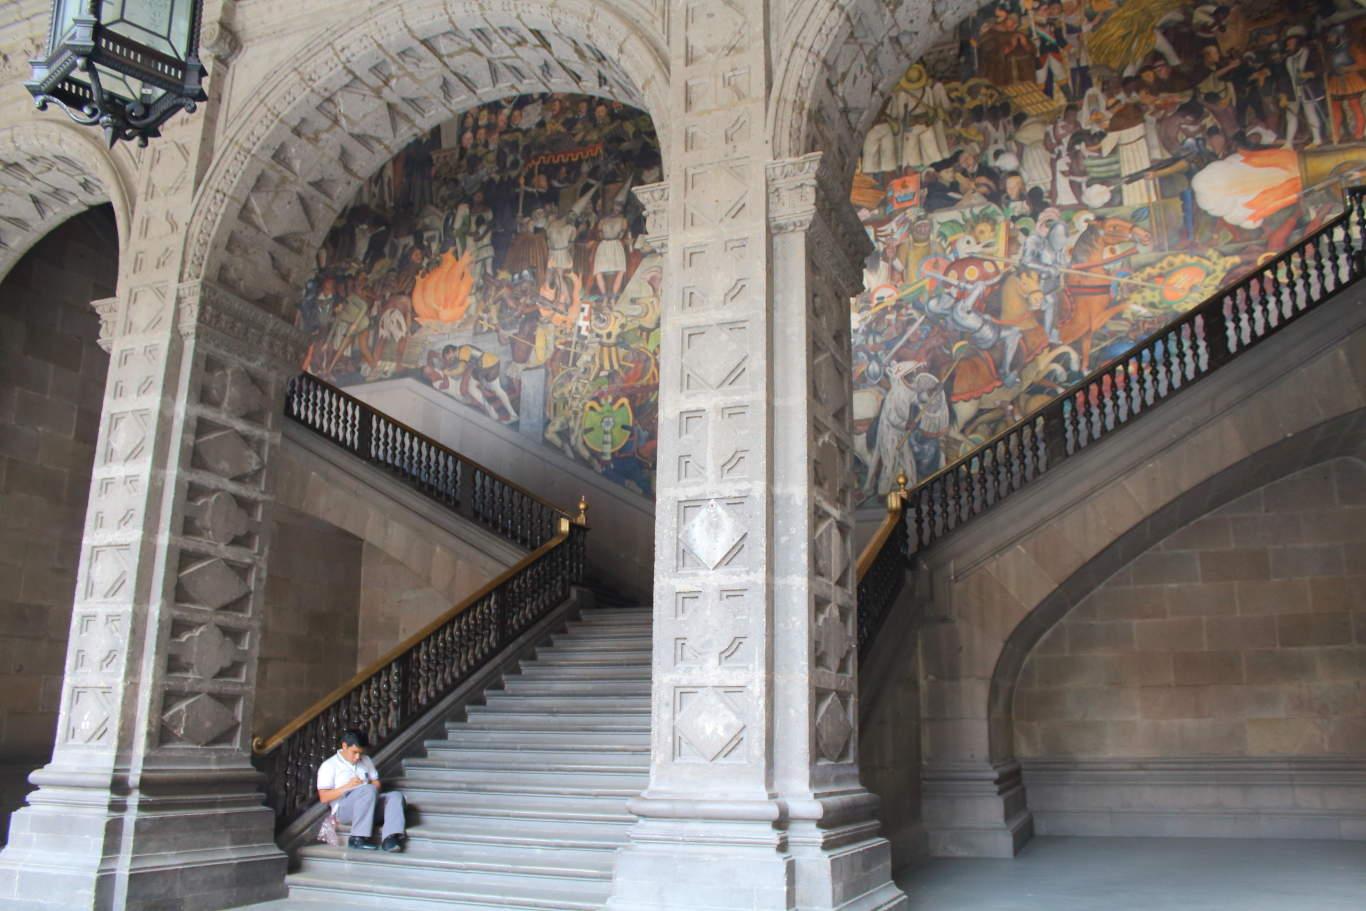 Diego Rivera, The History of Mexico, National Palace, Zócalo